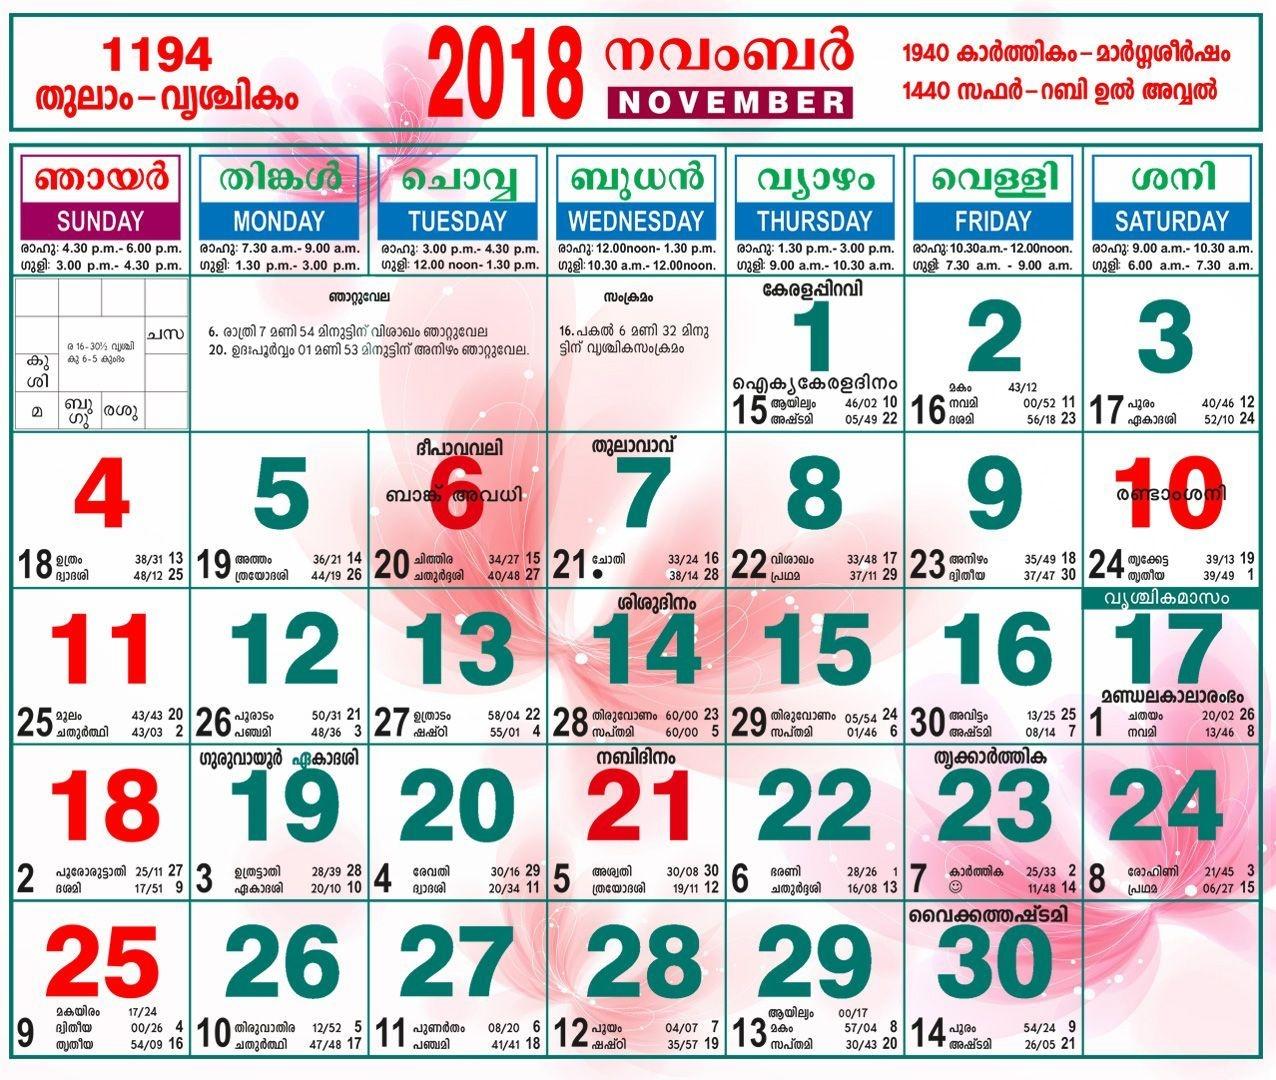 November 2018 Calendar Malayalam #calendar #malayalam